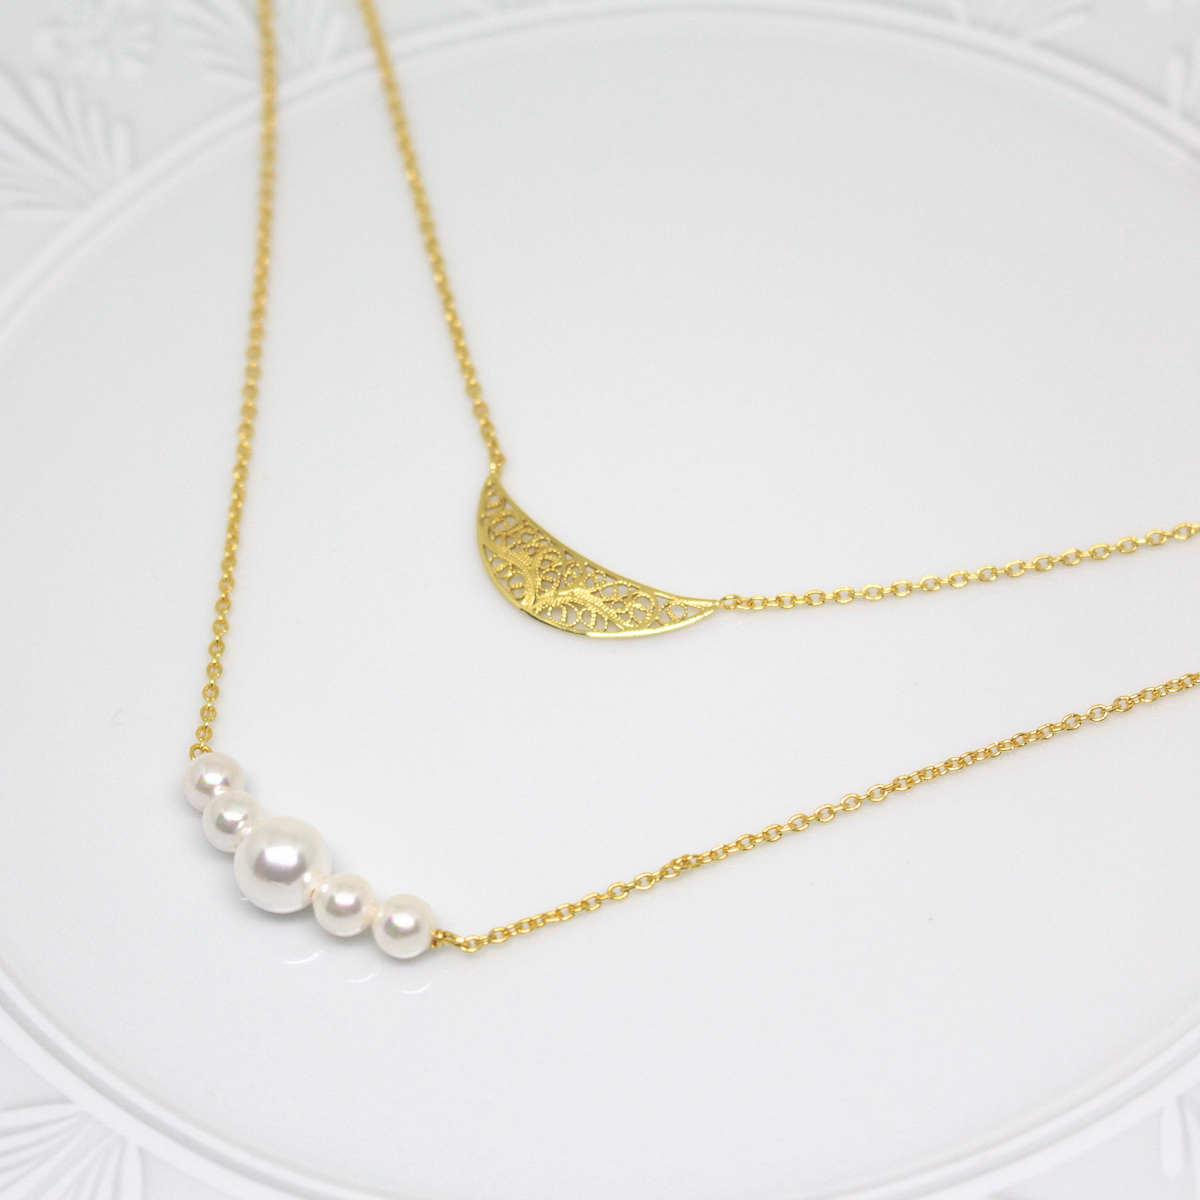 SOPHIA ムーン 2連ネックレス ゴールド/銀線細工・金線細工